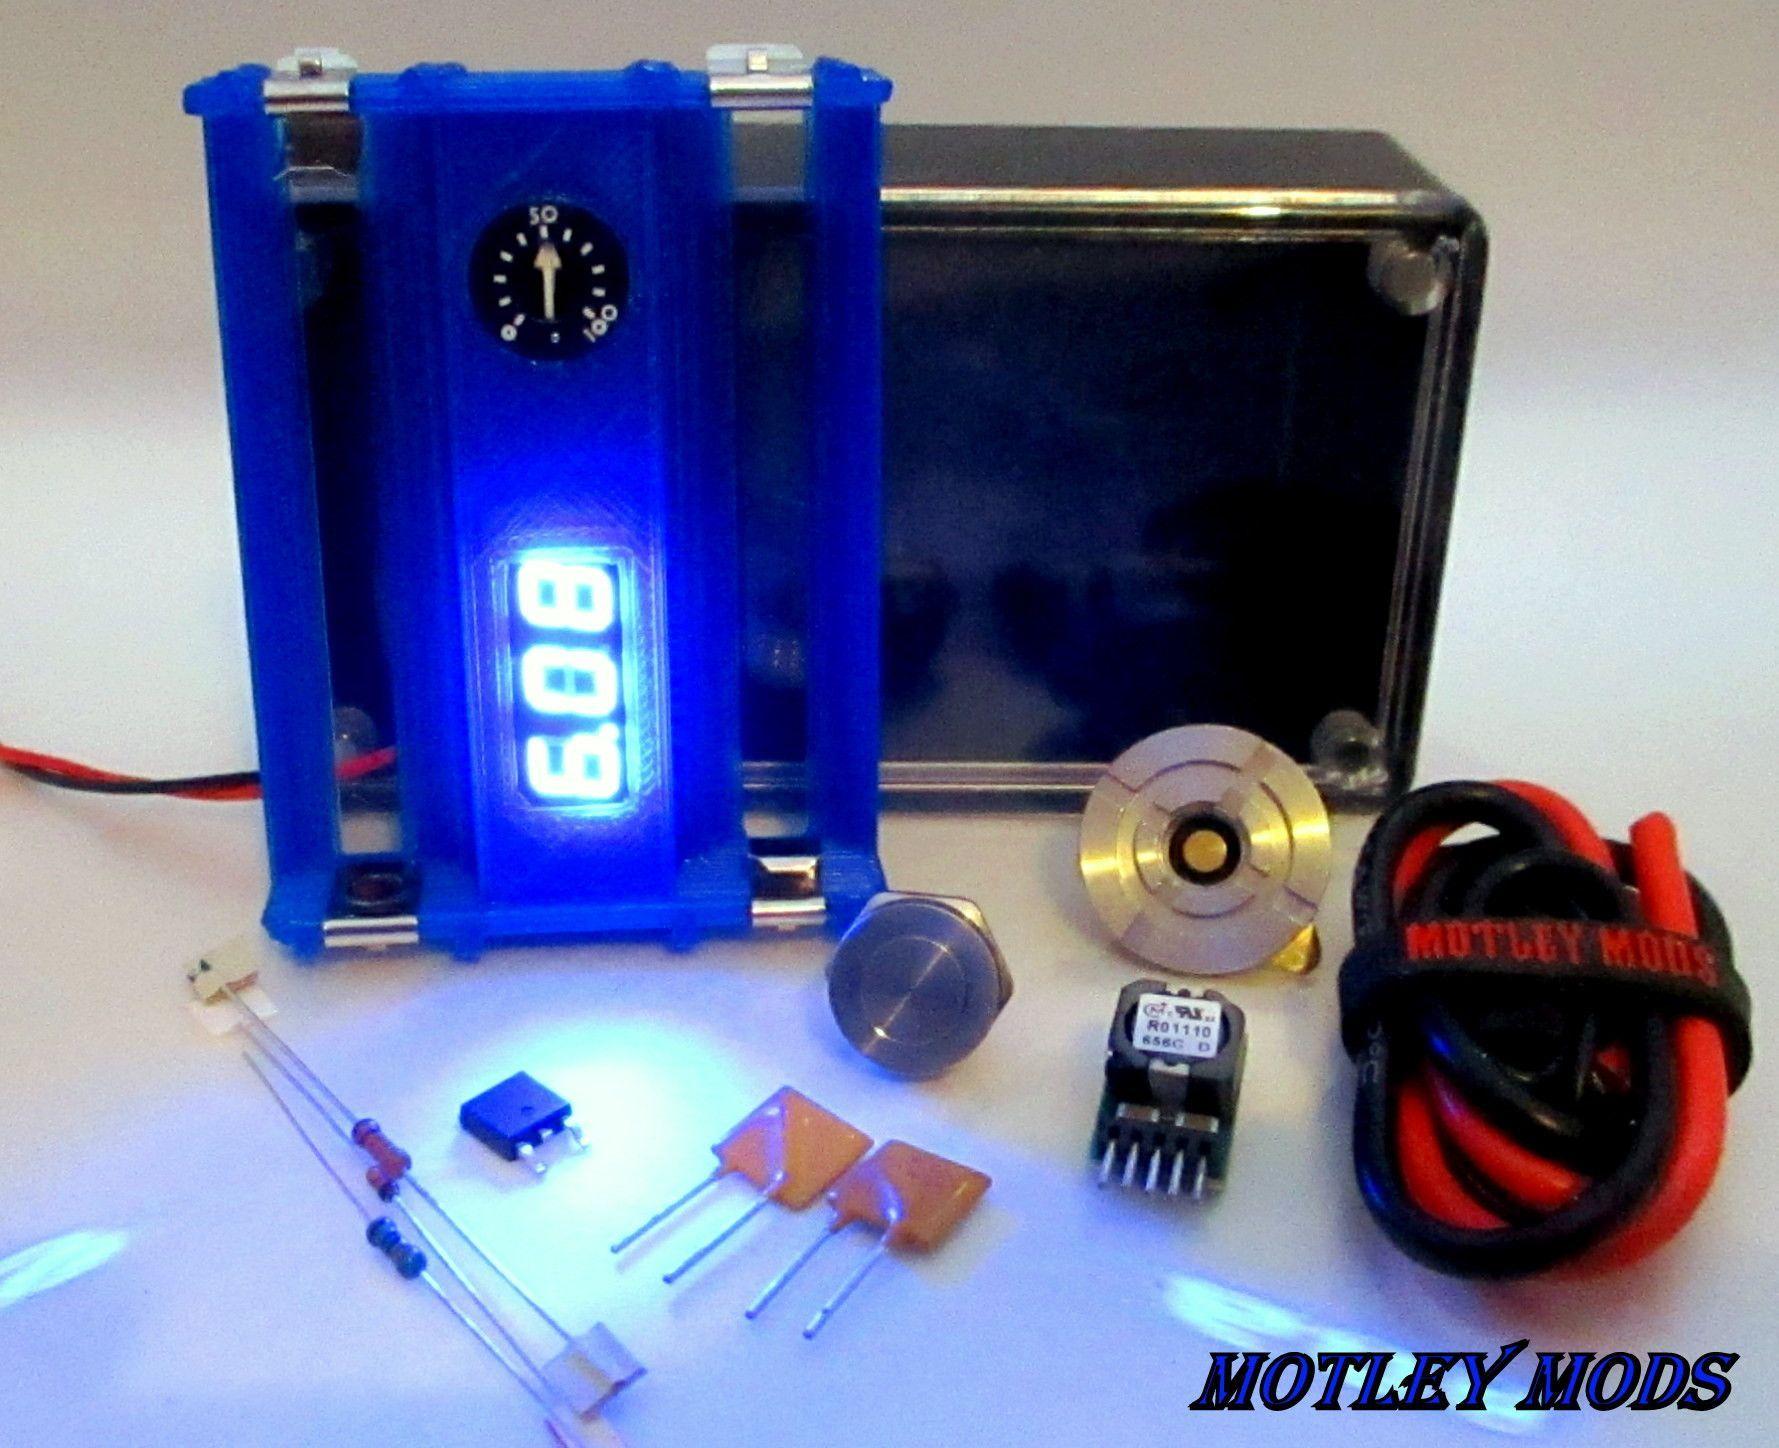 1591B OKRT10 Full Kit Diy box mod, Box mods, Mod